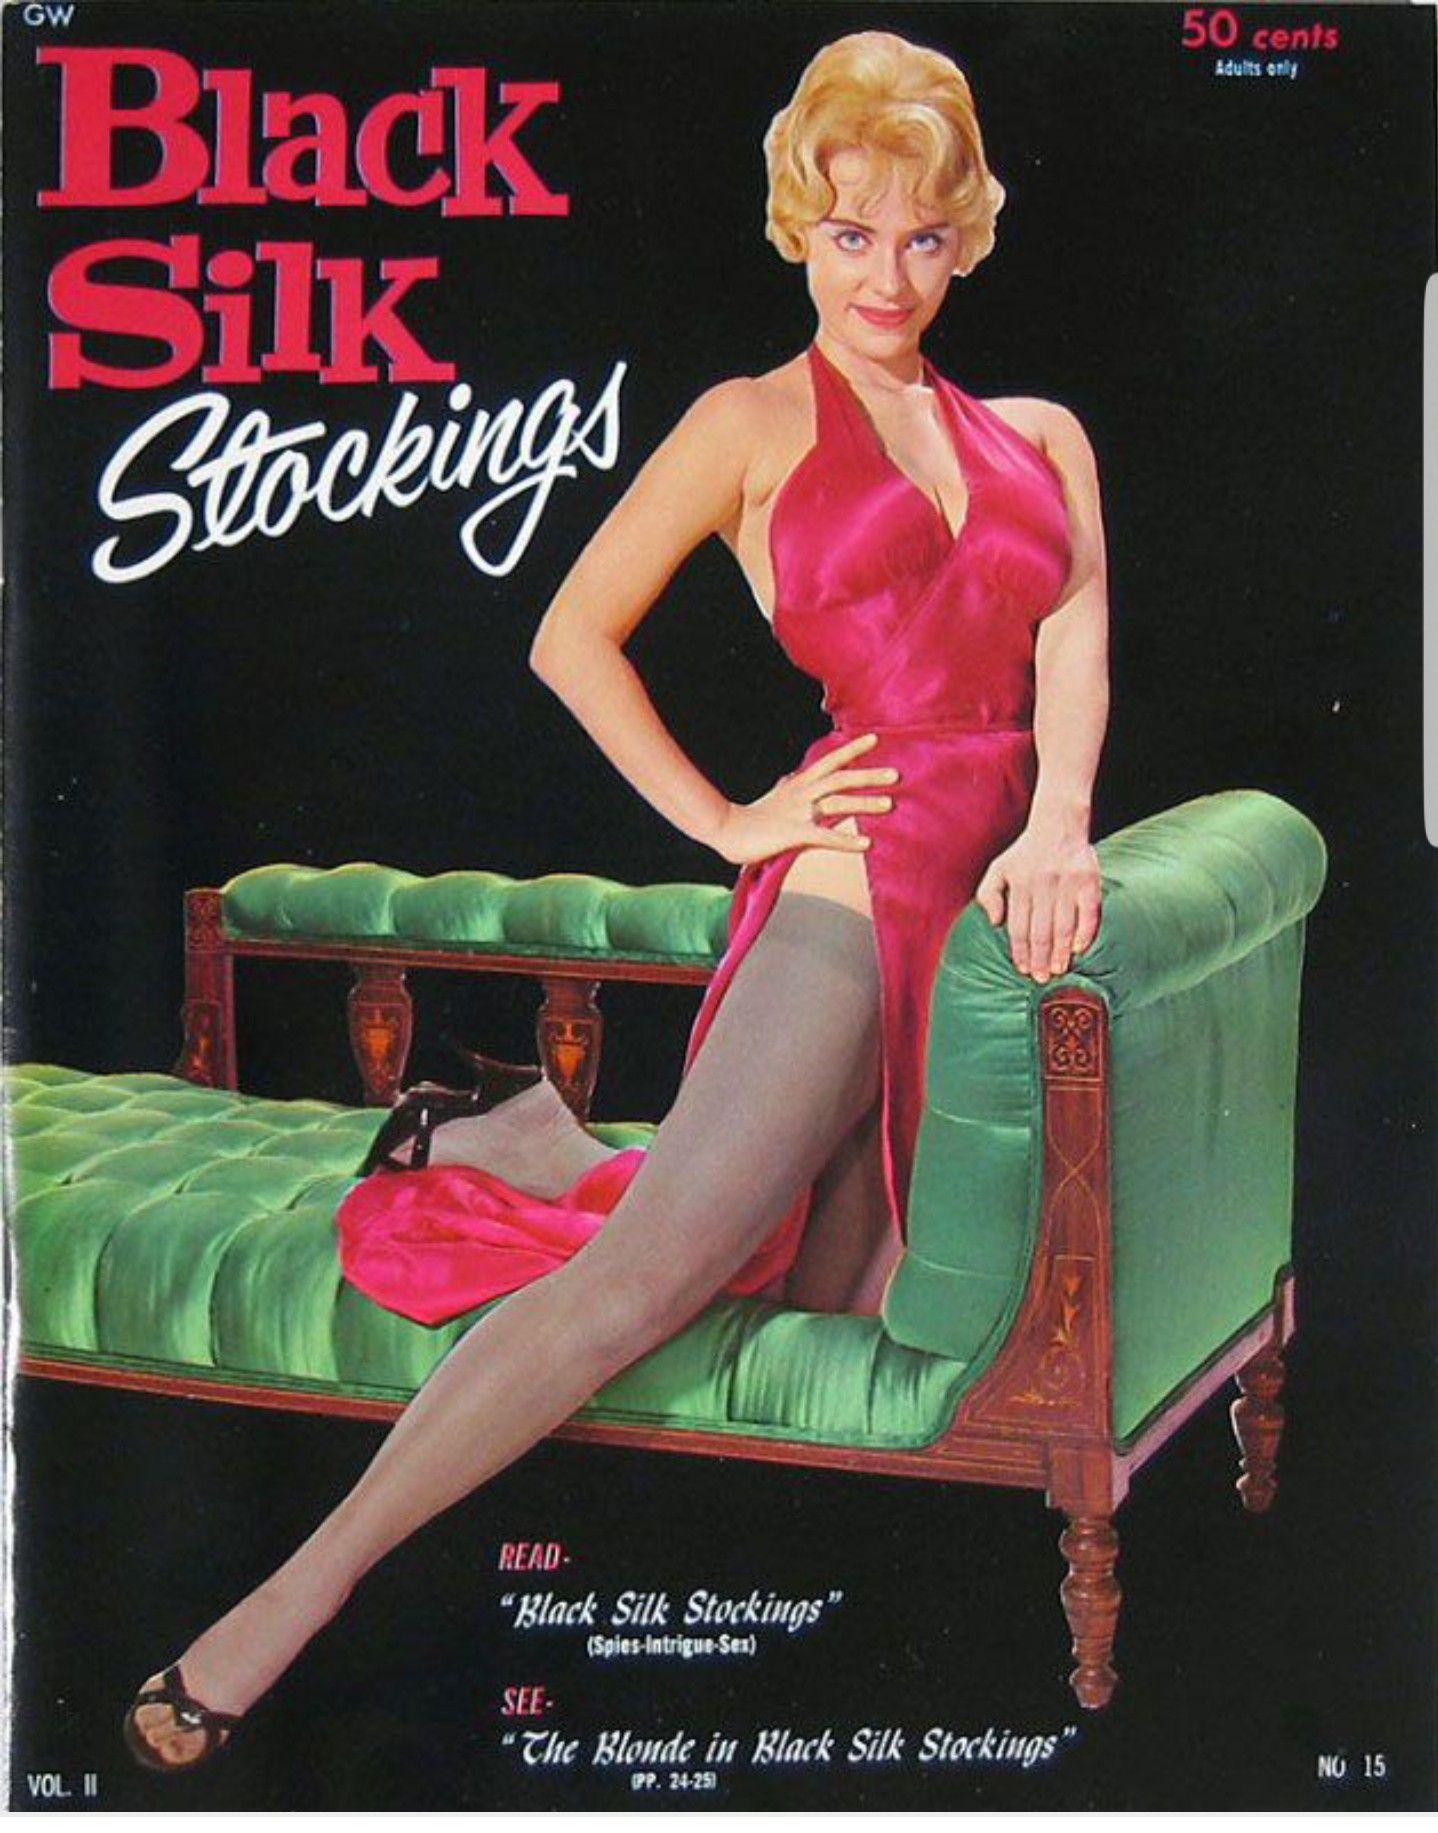 Pin on Vintage Outfits & Nylon Stockings